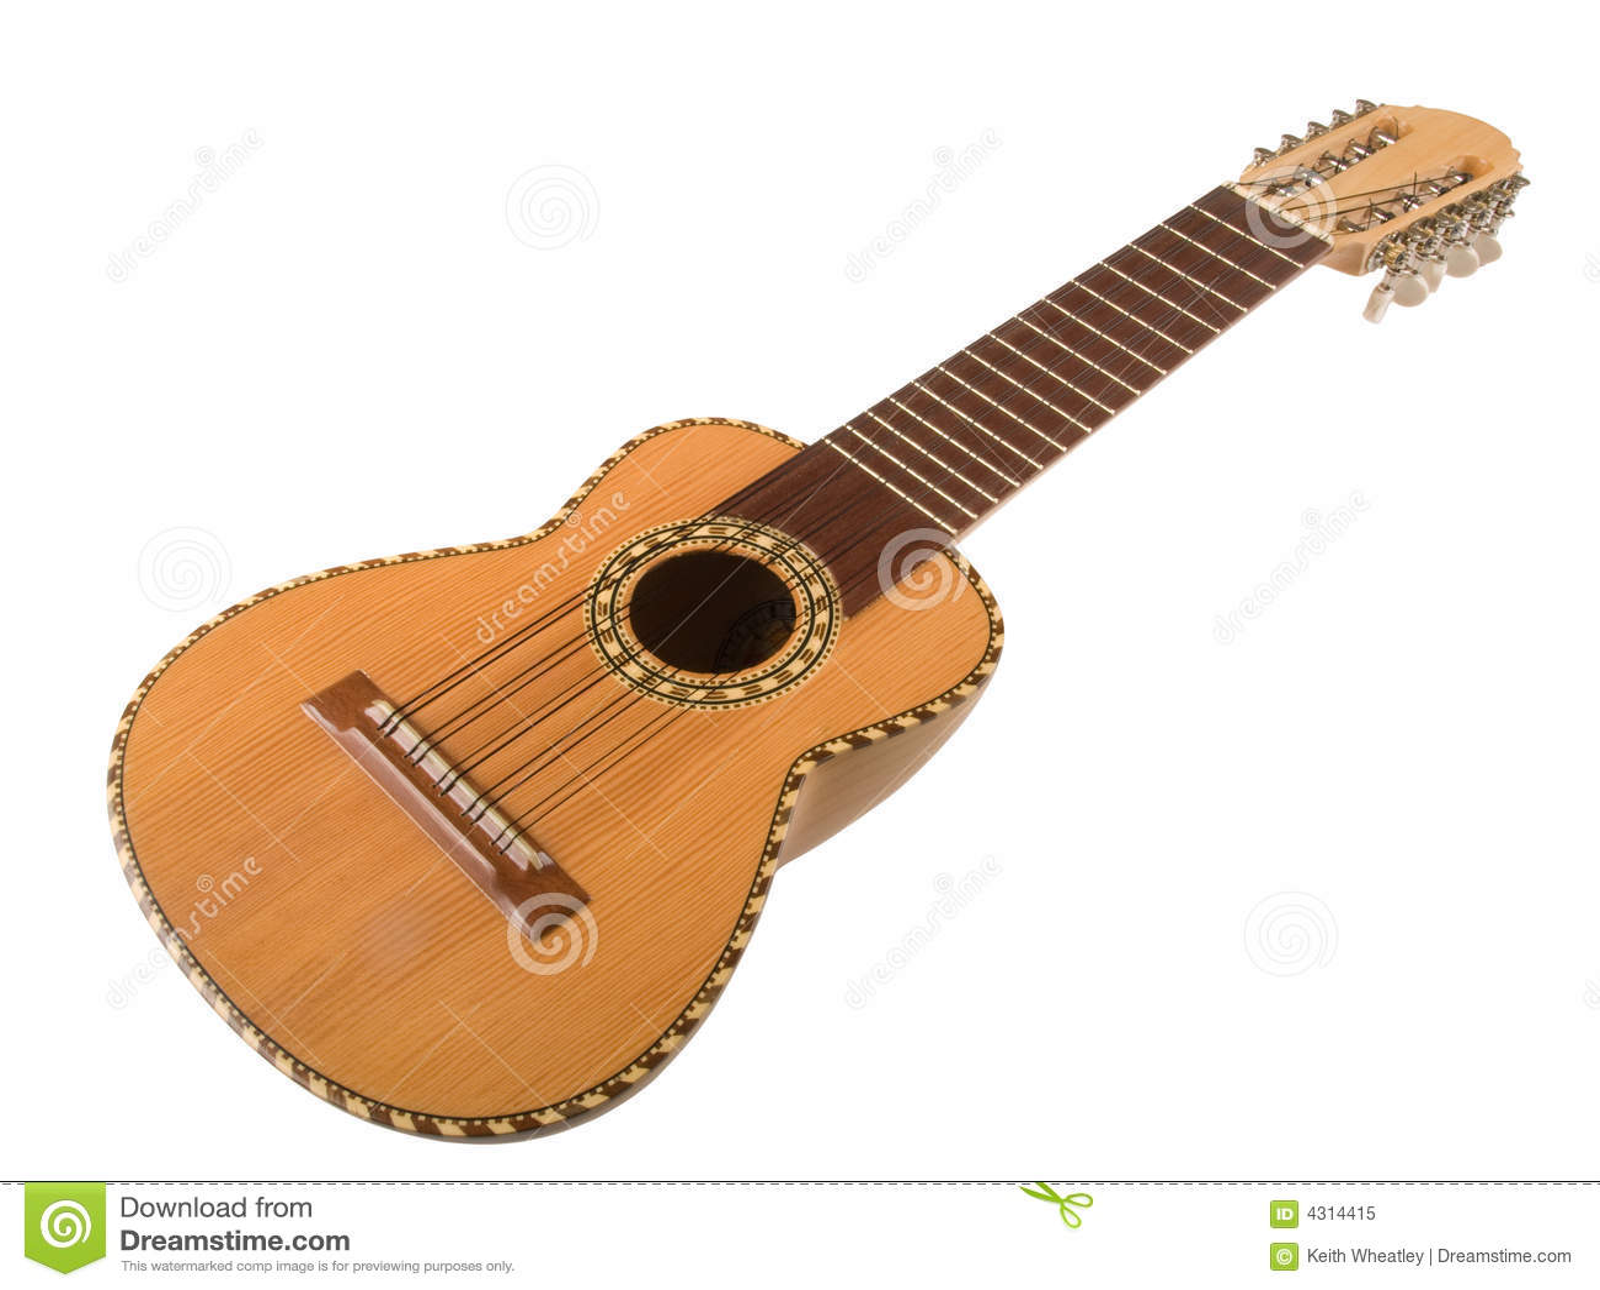 peruvian charango guitar stock image image of frets wood grain clip art templates for free wood grain clip art black outline